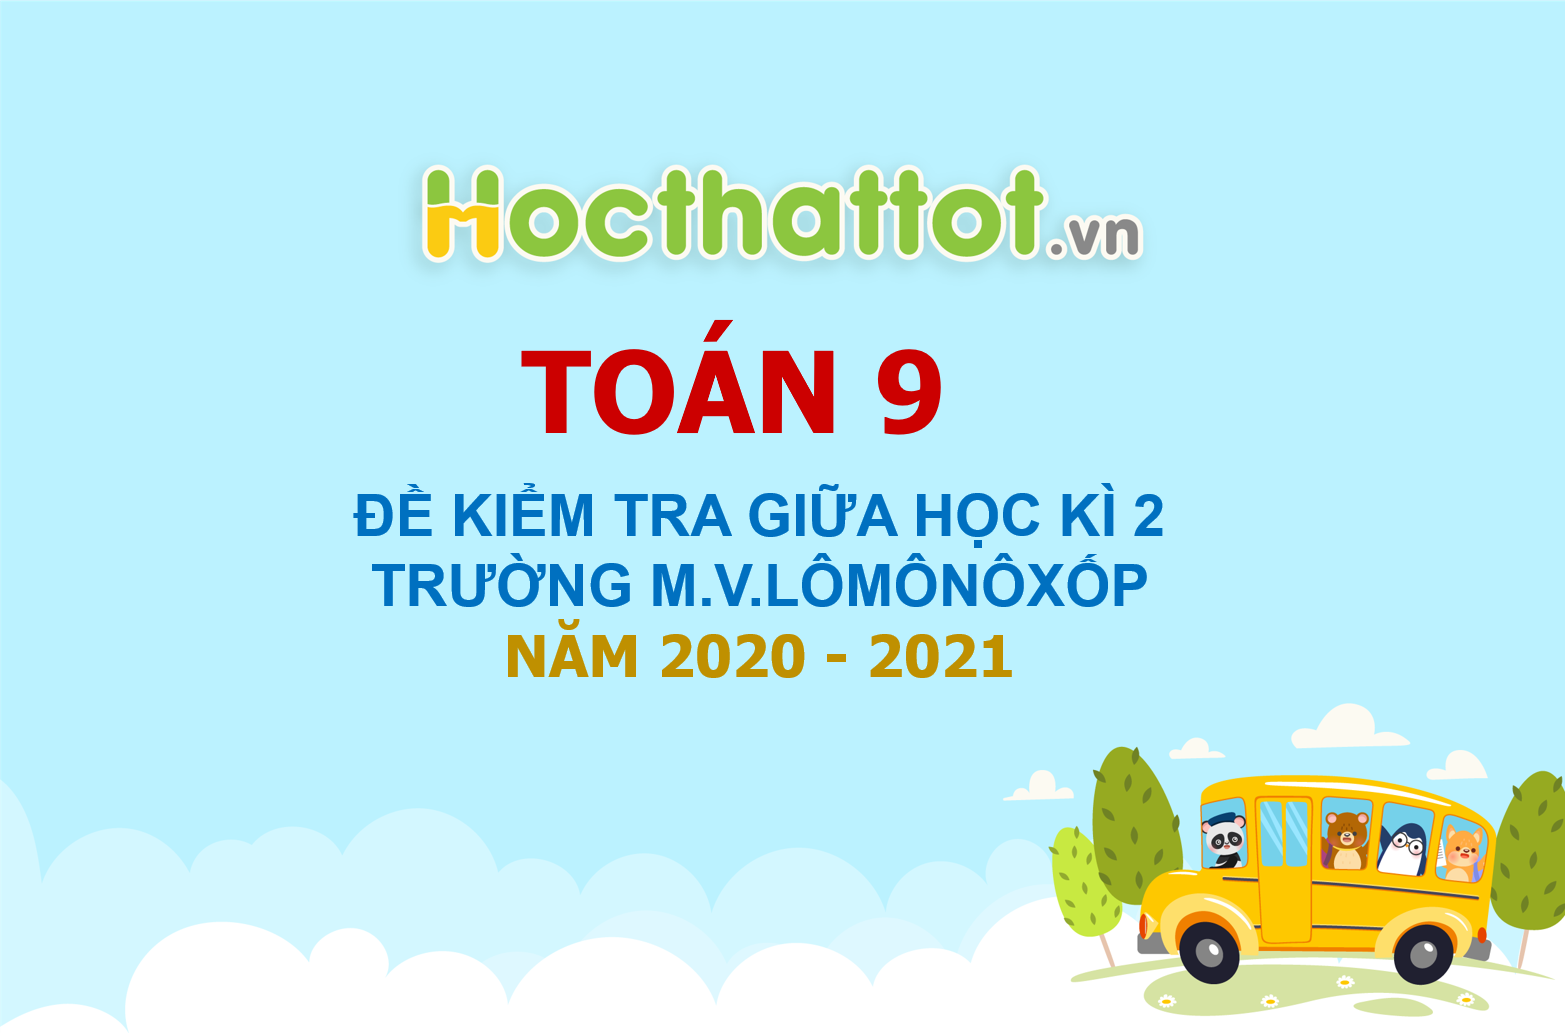 de-kiem-tra-giua-hoc-ki2-lop9-truong-monoloxop nam-2020-2021